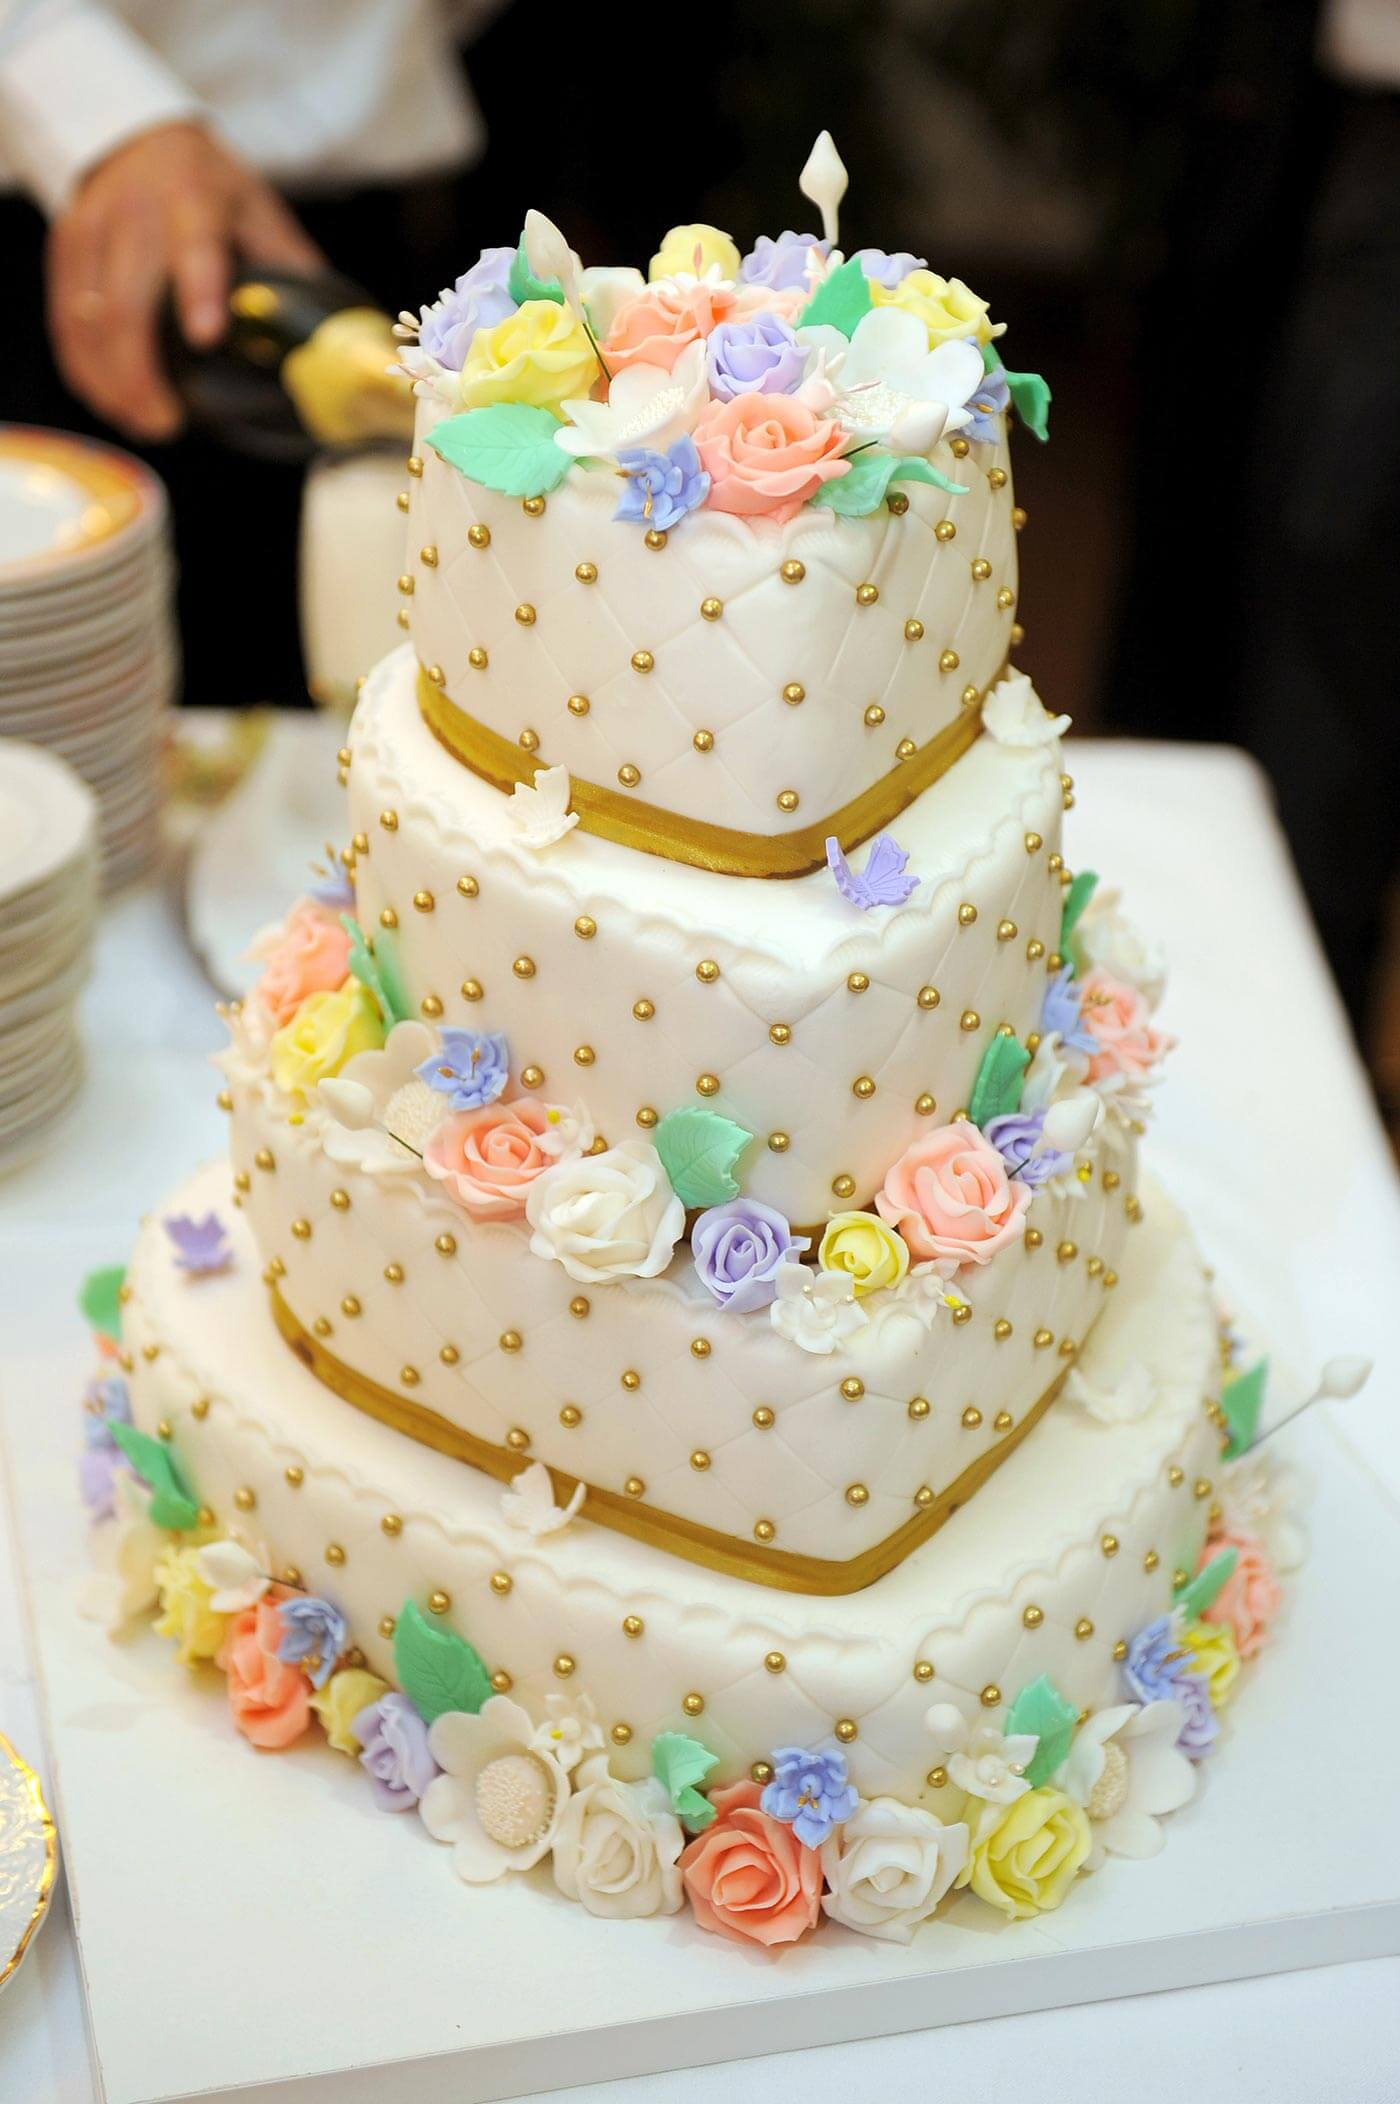 Elegant Wedding Fondant Cakes